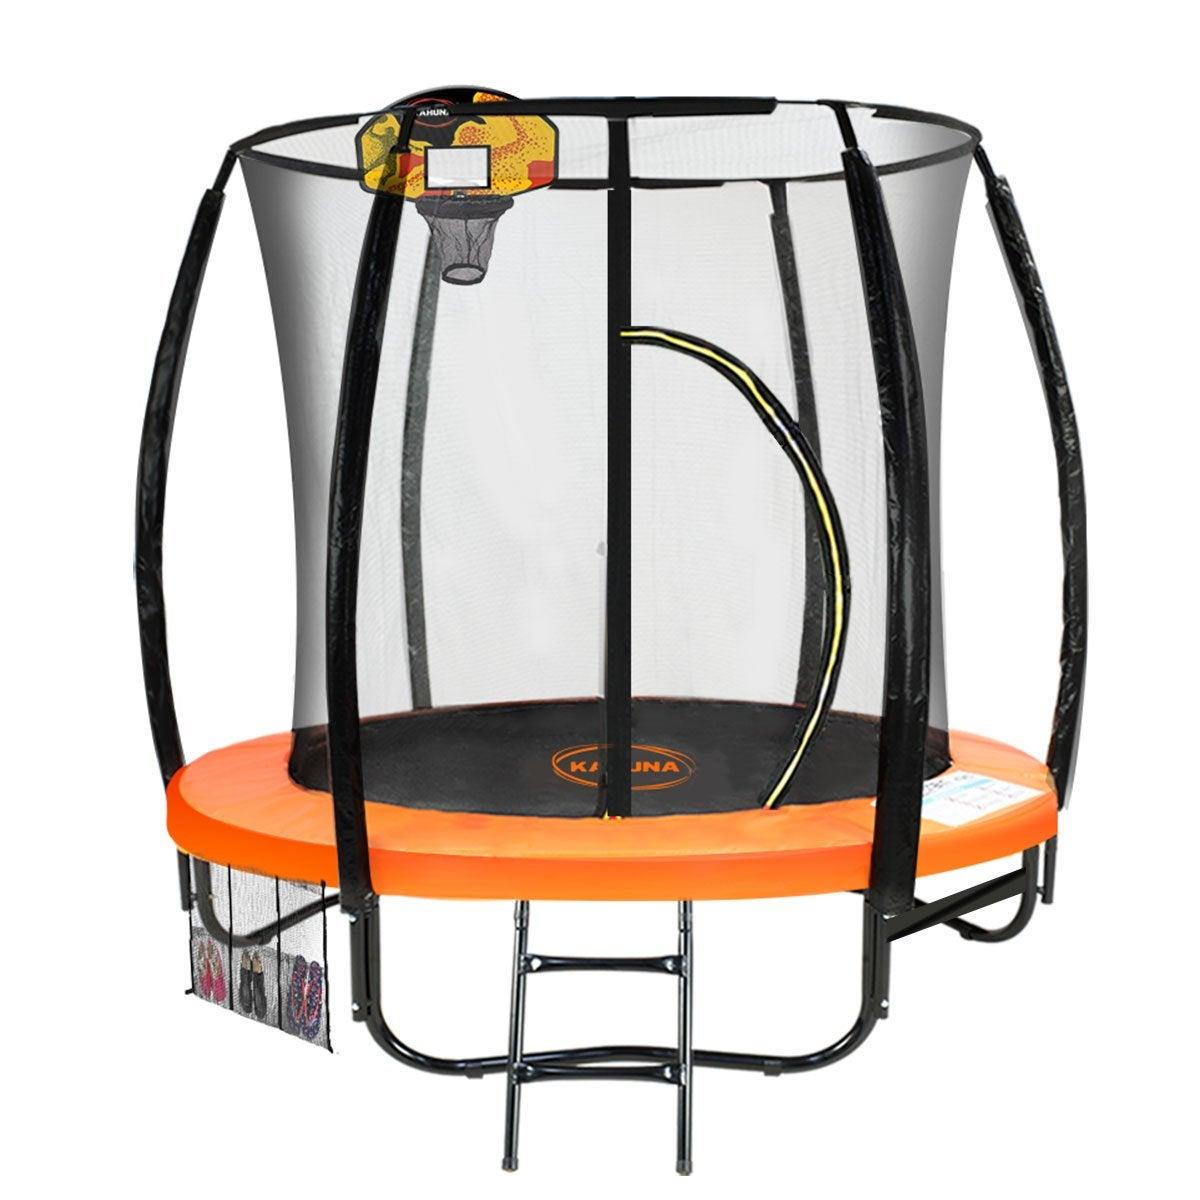 6ft Kahuna Trampoline Safety Net Spring Pad Cover Mat Free Ladder Basketball Set